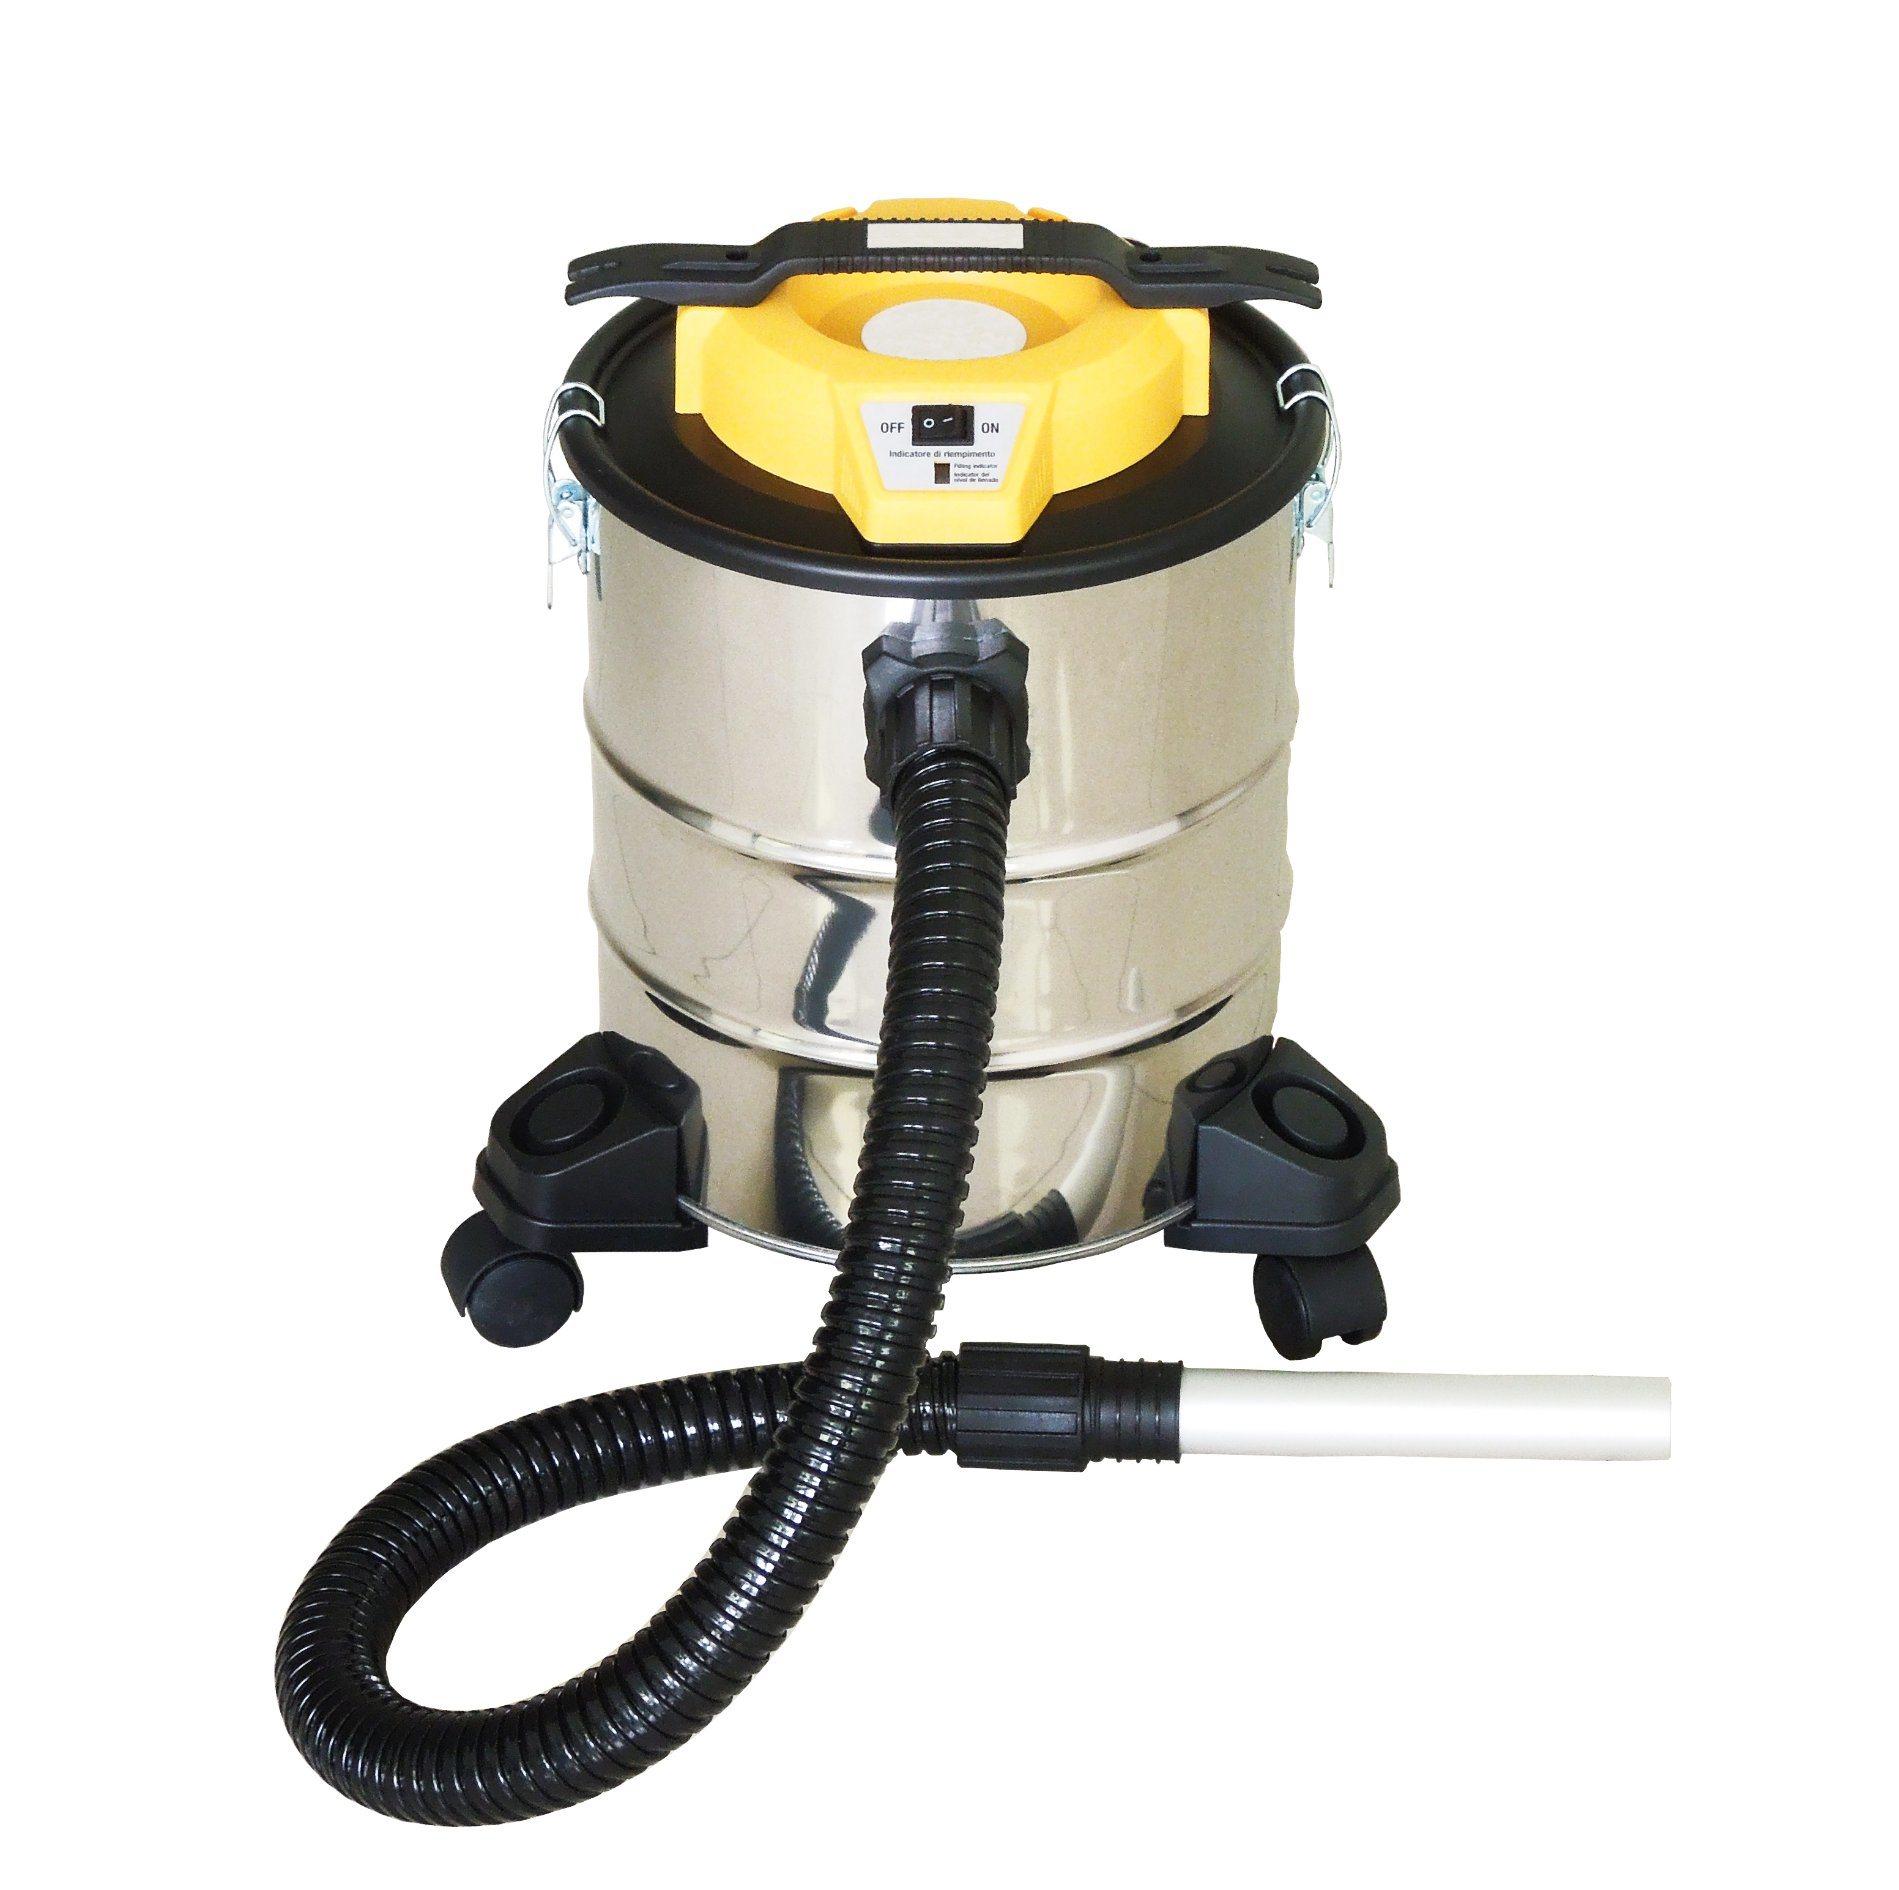 China 401 12l Electric Dry Dust Fireplace Ash Bbq Vacuum